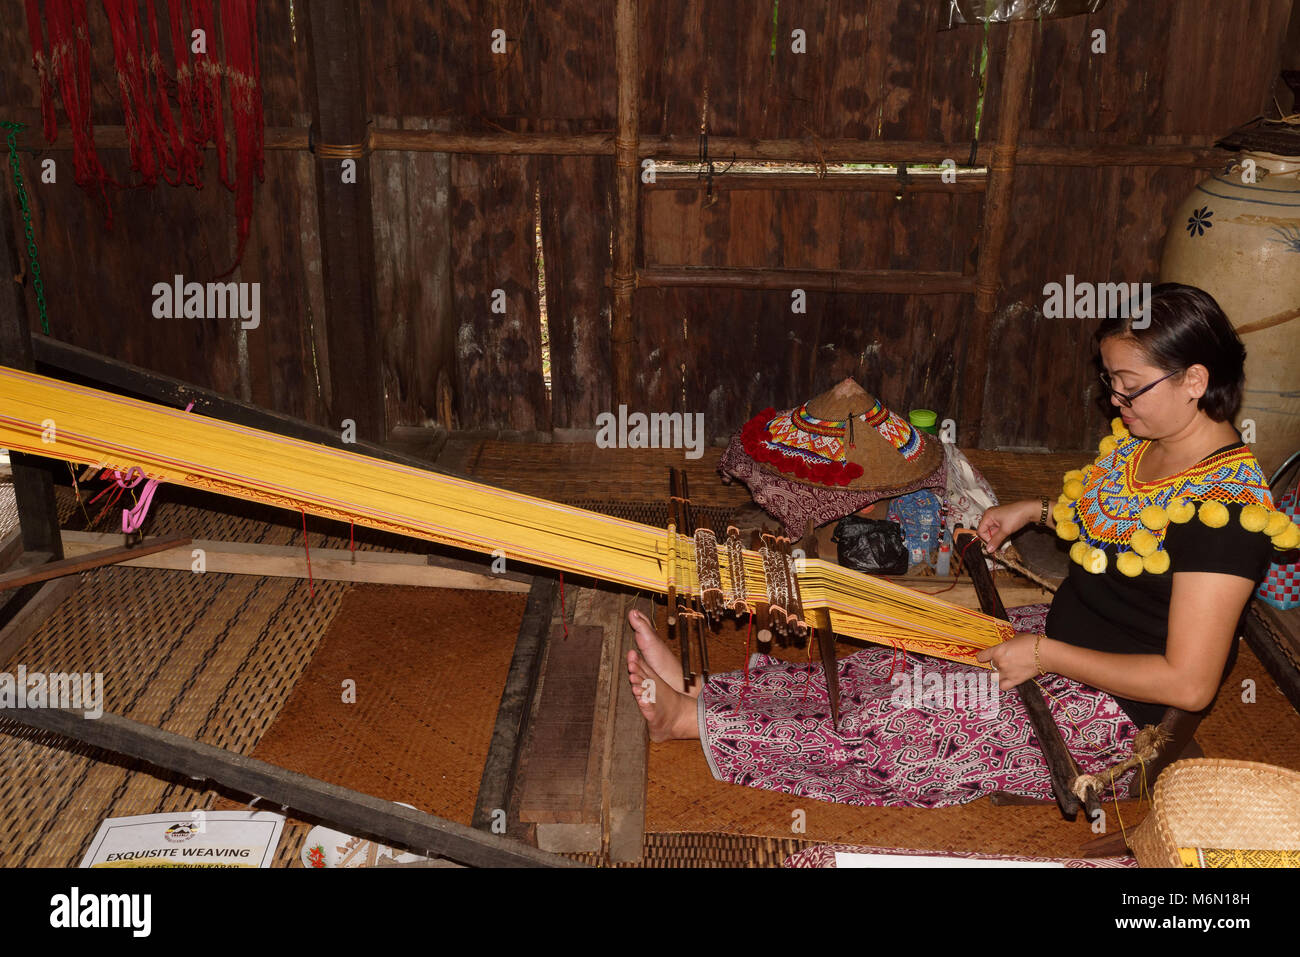 longhouse village in sarawak malaysia stock photos. Black Bedroom Furniture Sets. Home Design Ideas